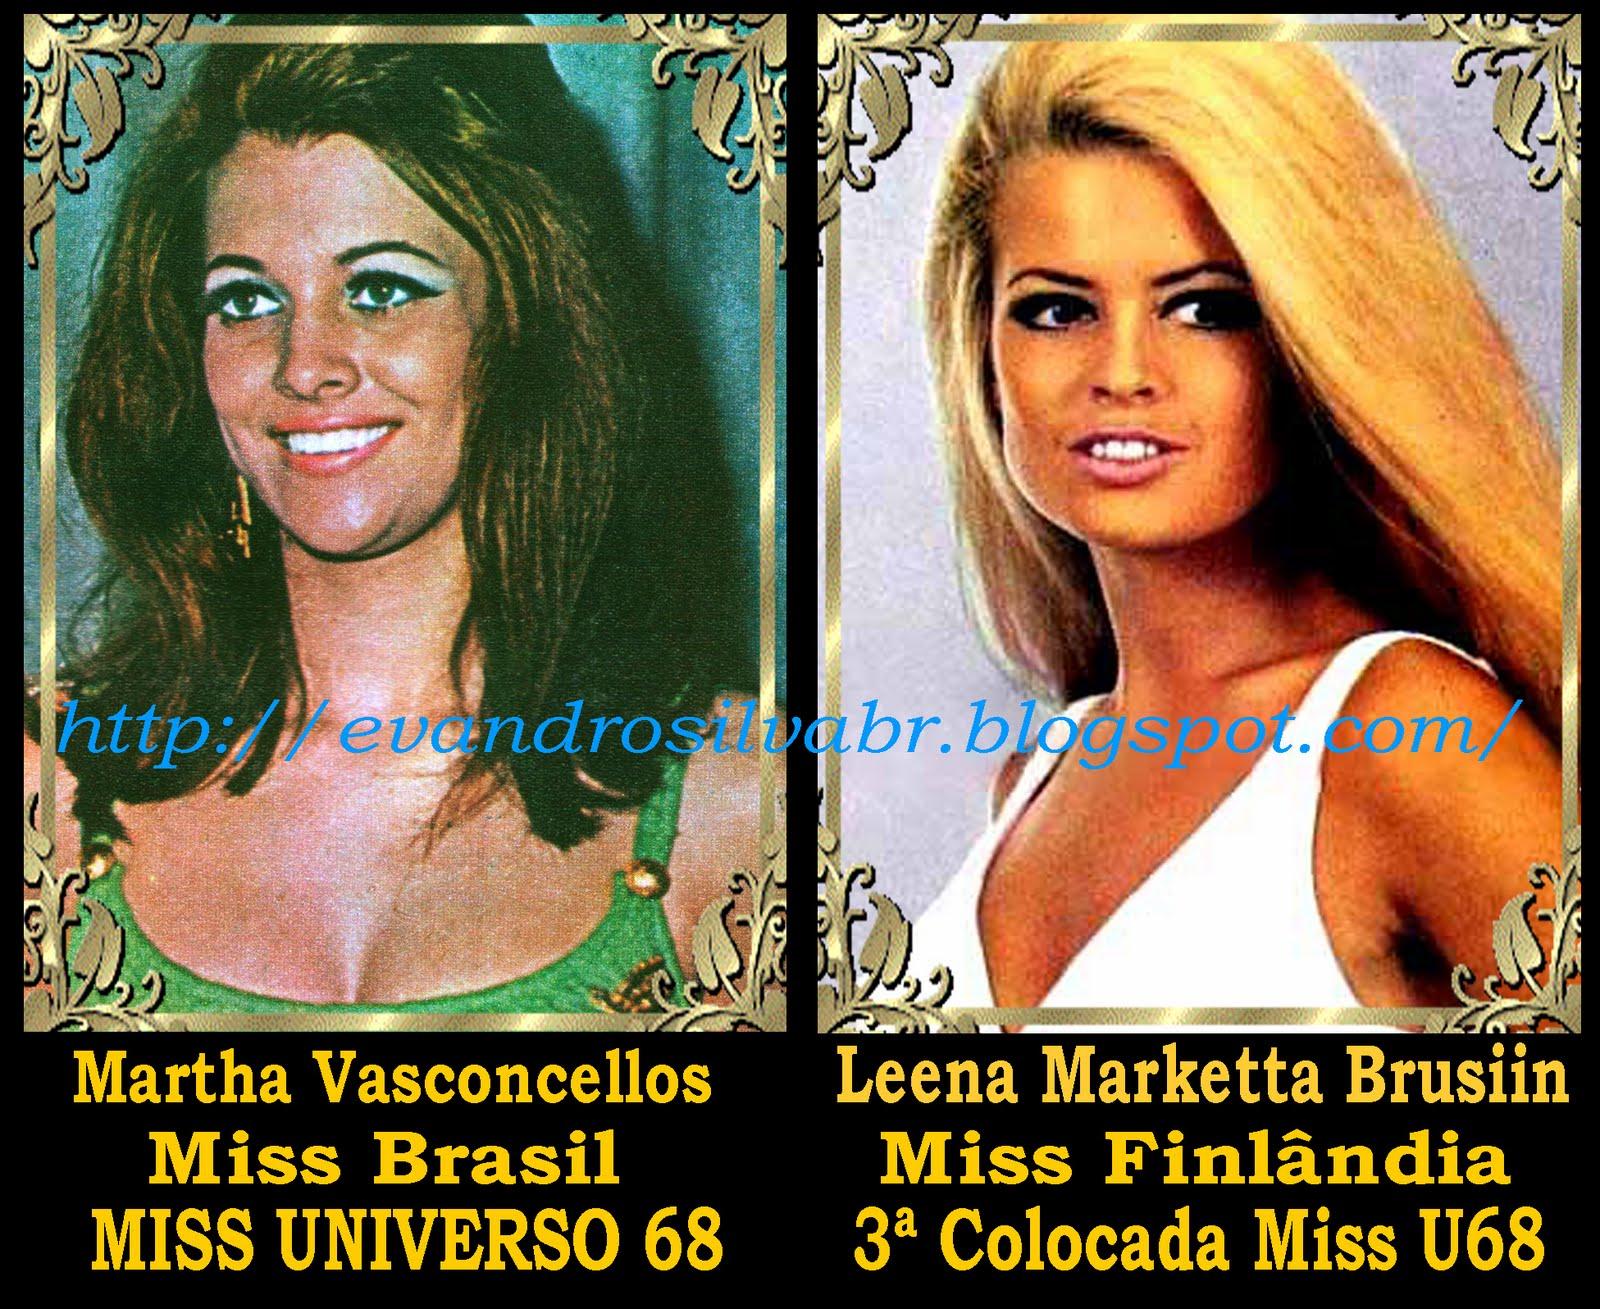 ☽ ✮ ✯ ✰ ☆ ☁ Galeria de Martha Vasconcelos, Miss Universe 1968.☽ ✮ ✯ ✰ ☆ ☁ - Página 2 Martha+e+Leena+Brussin+copy